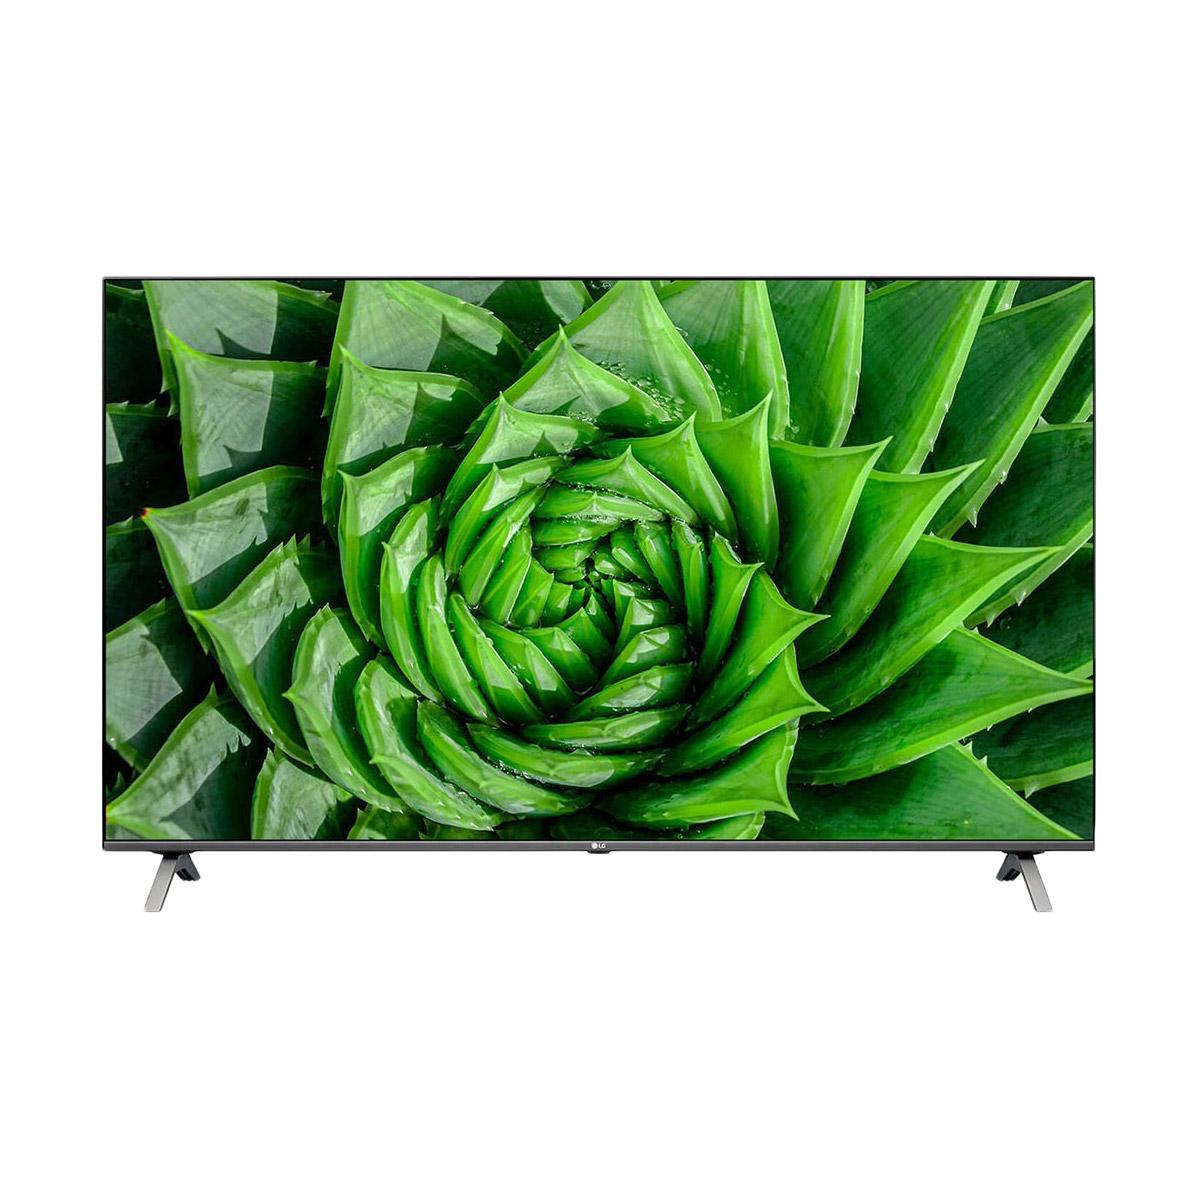 Фото - Телевизор LG 65 65UN80006LA жк телевизор lg 60 60uj634v 60uj634v